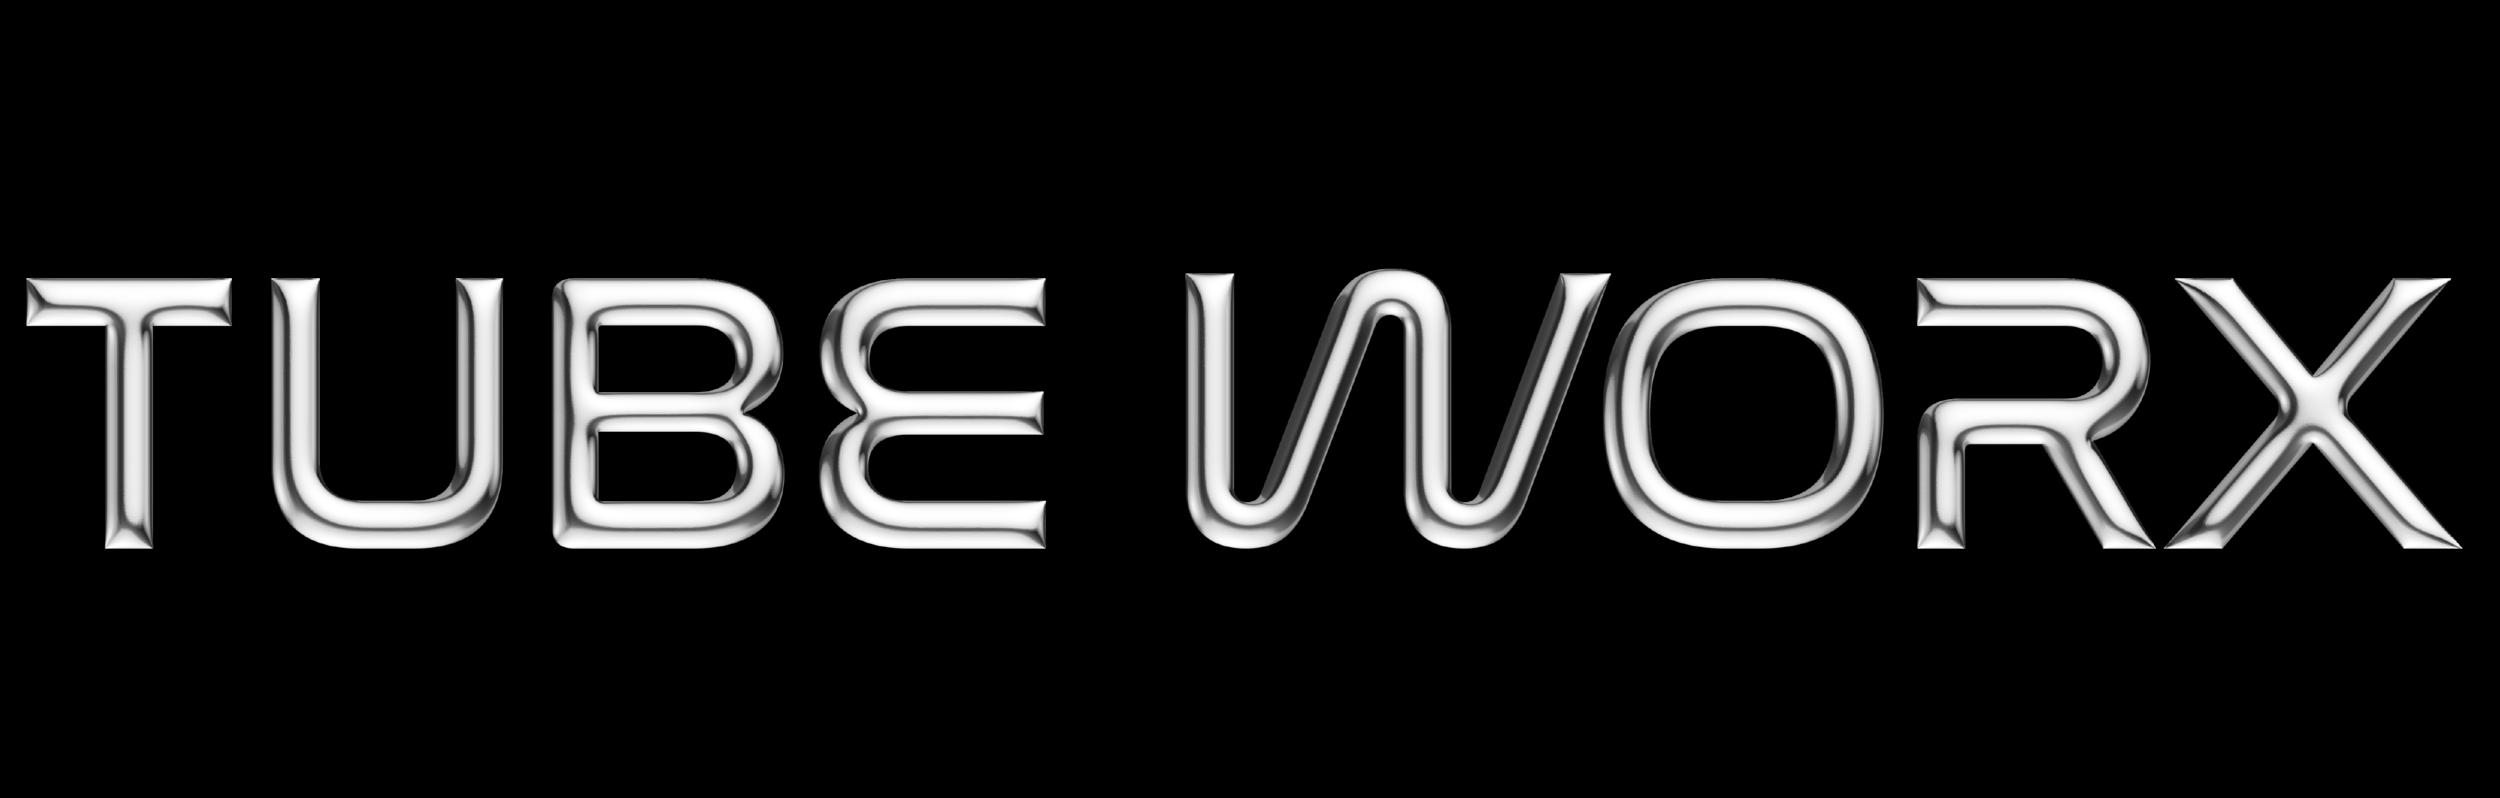 Tube Worx Logo - Chrome.png